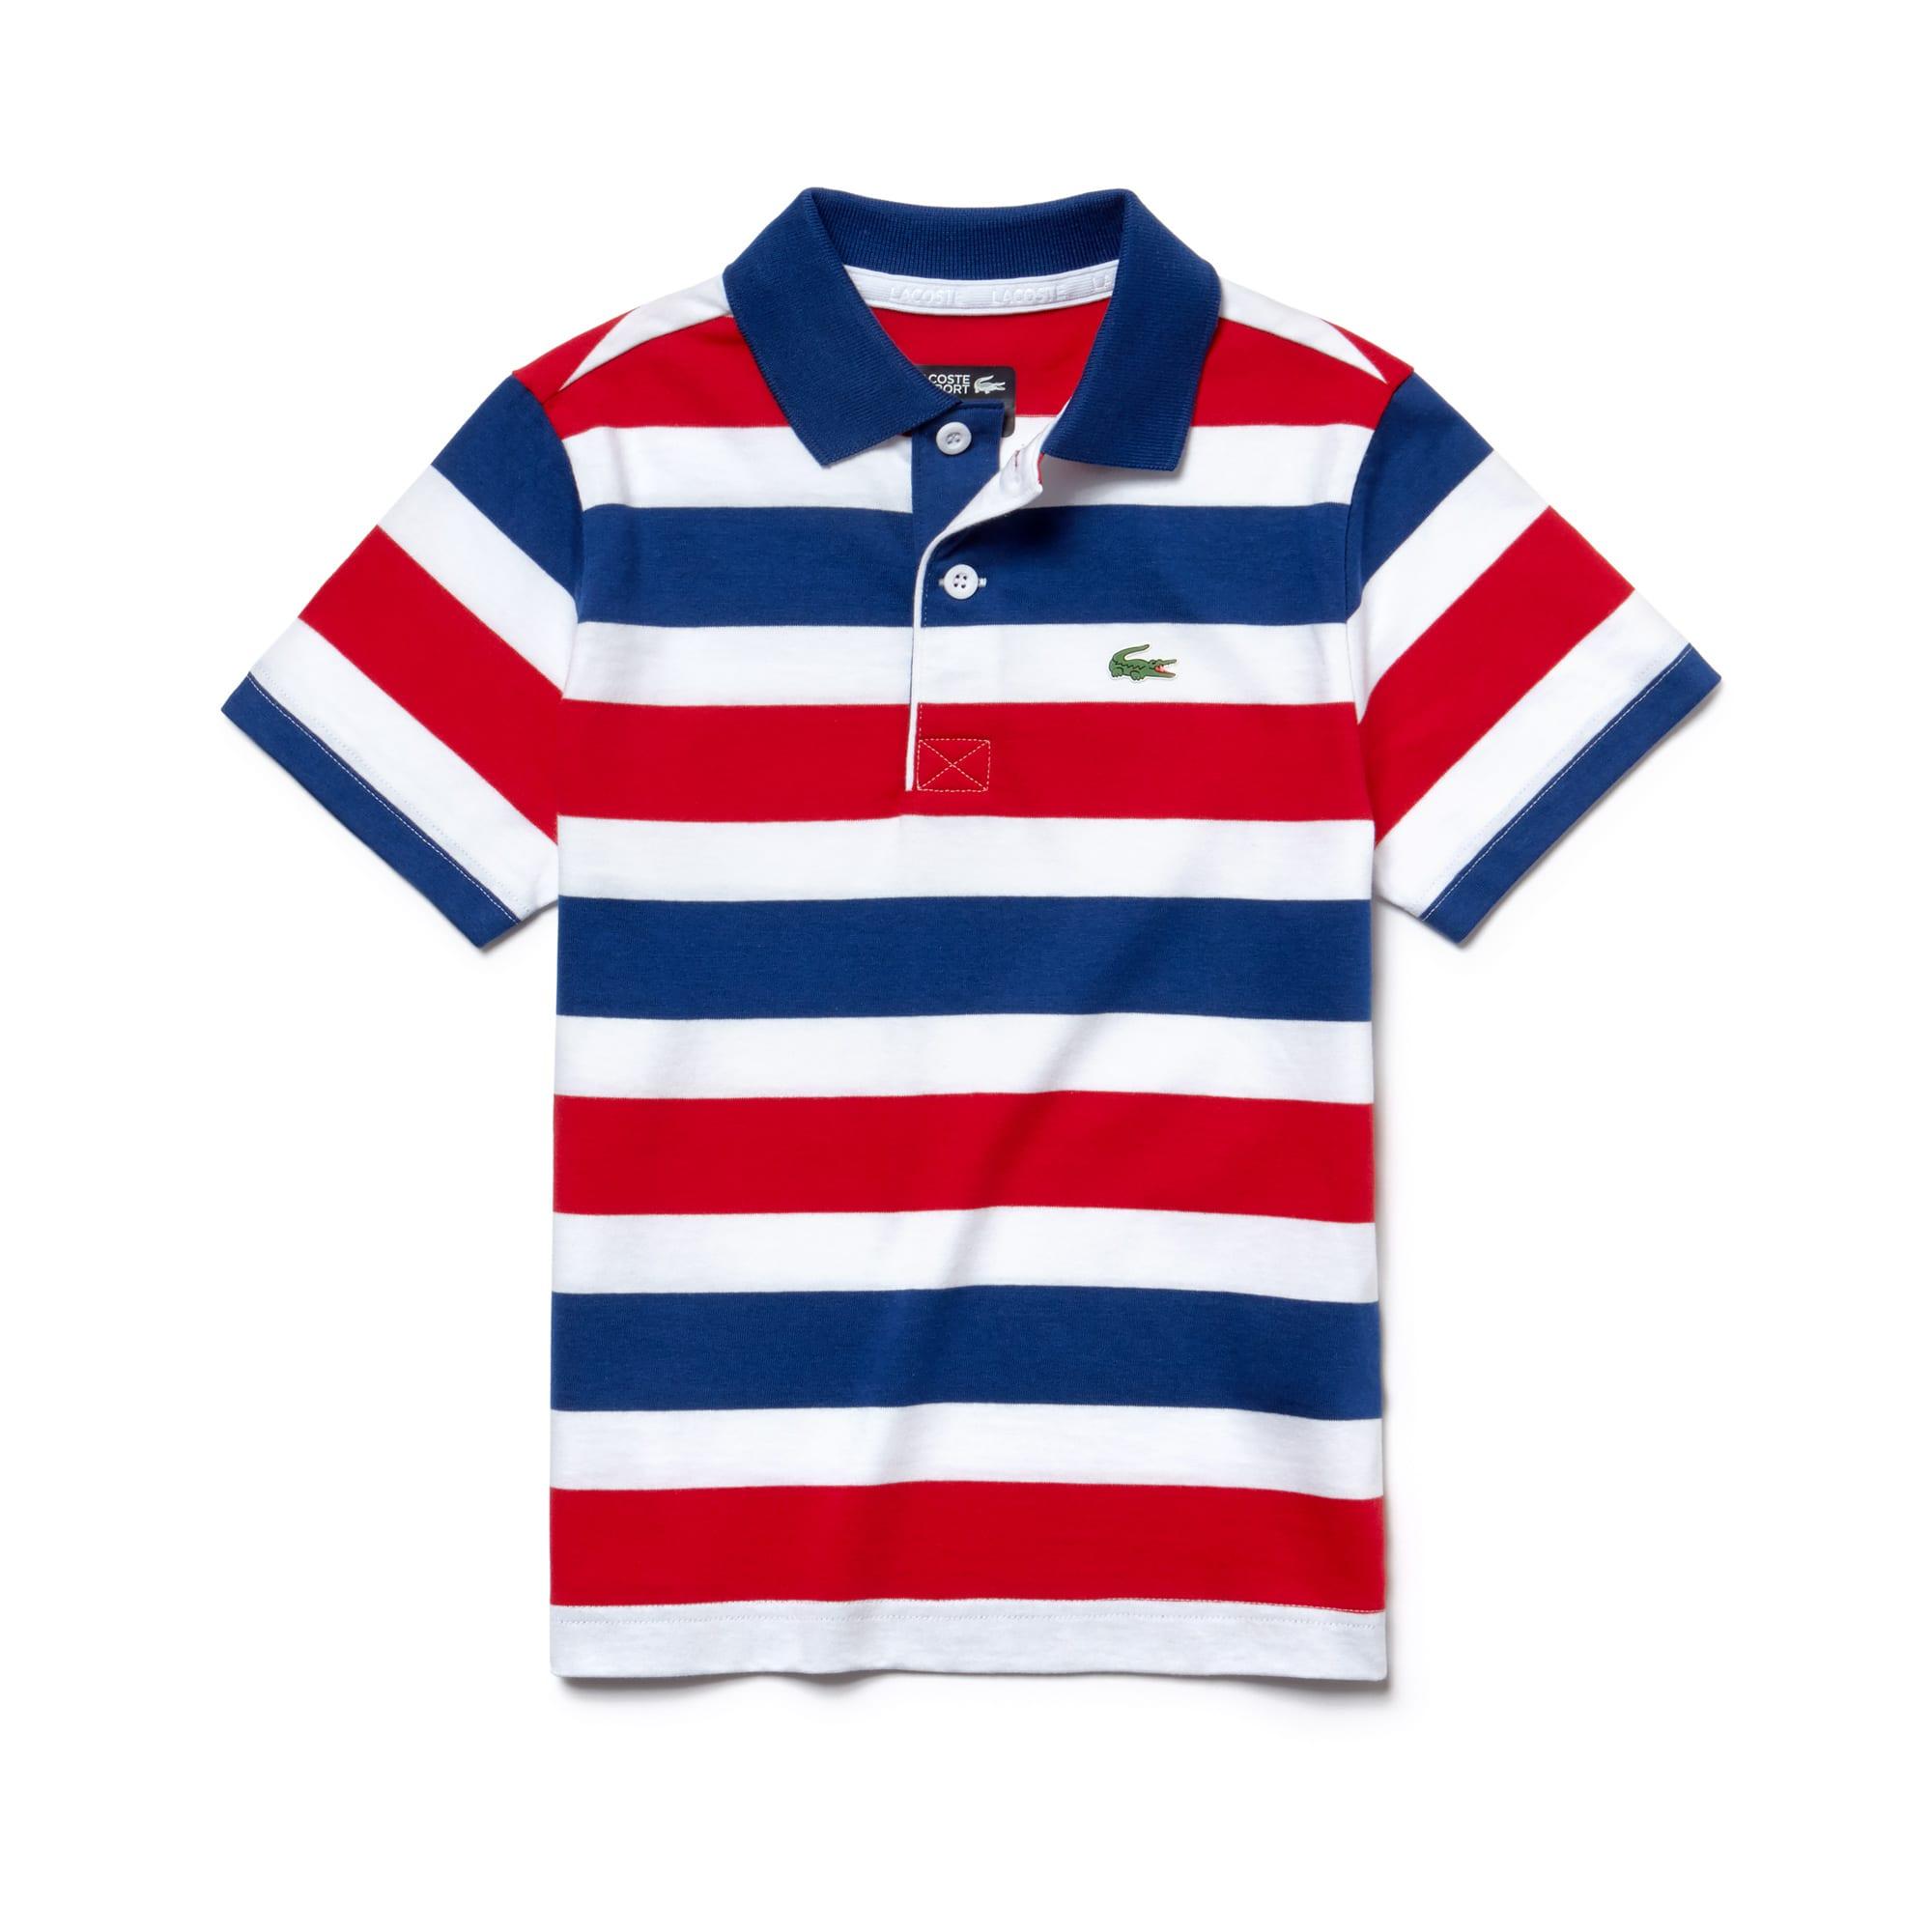 Boys' Lacoste SPORT Striped Cotton Jersey Tennis Polo Shirt